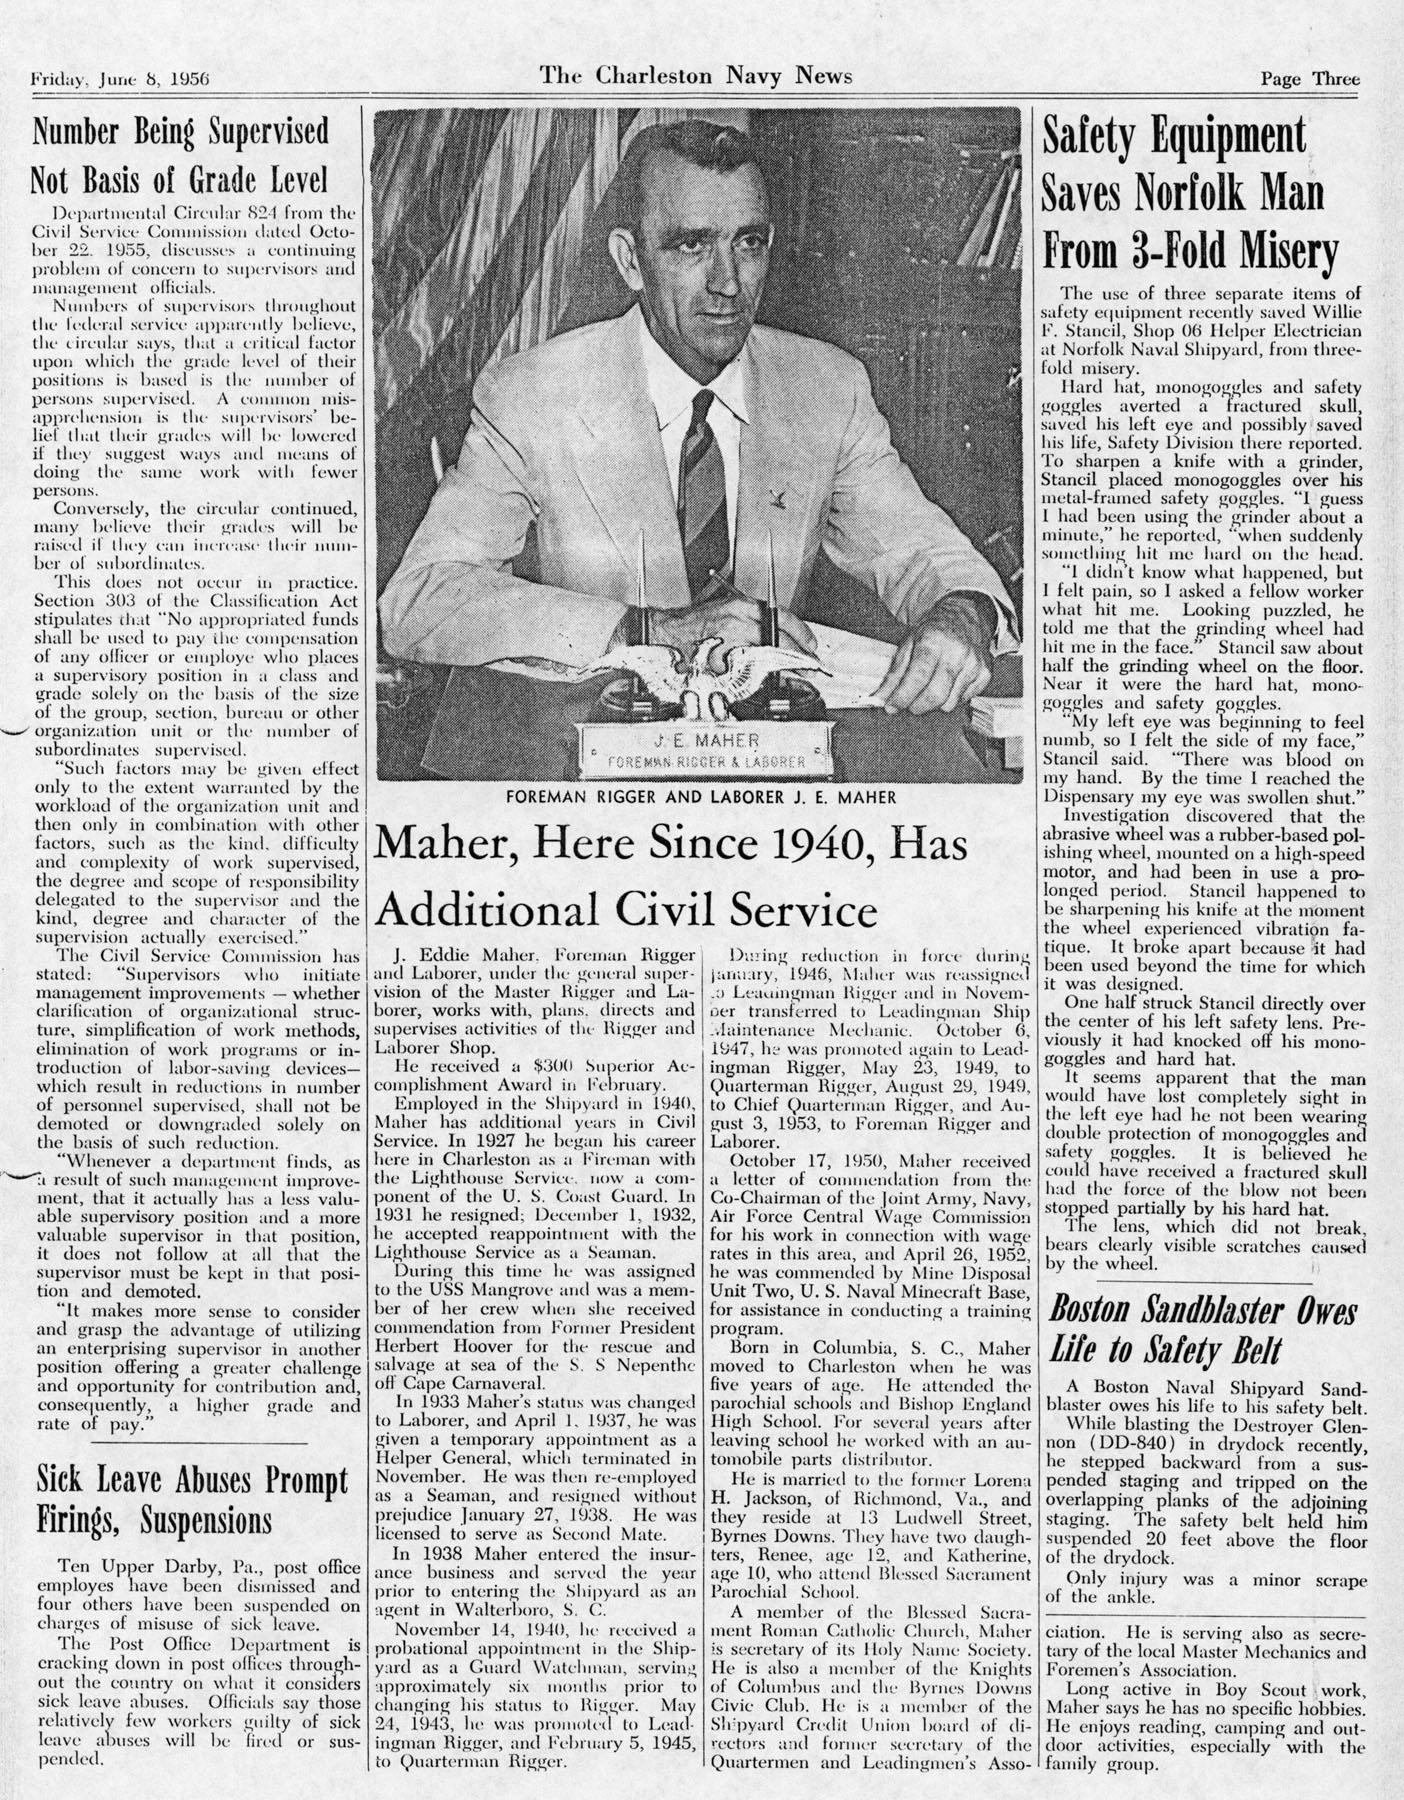 The Charleston Navy News, Volume 14, Edition 23, page iii